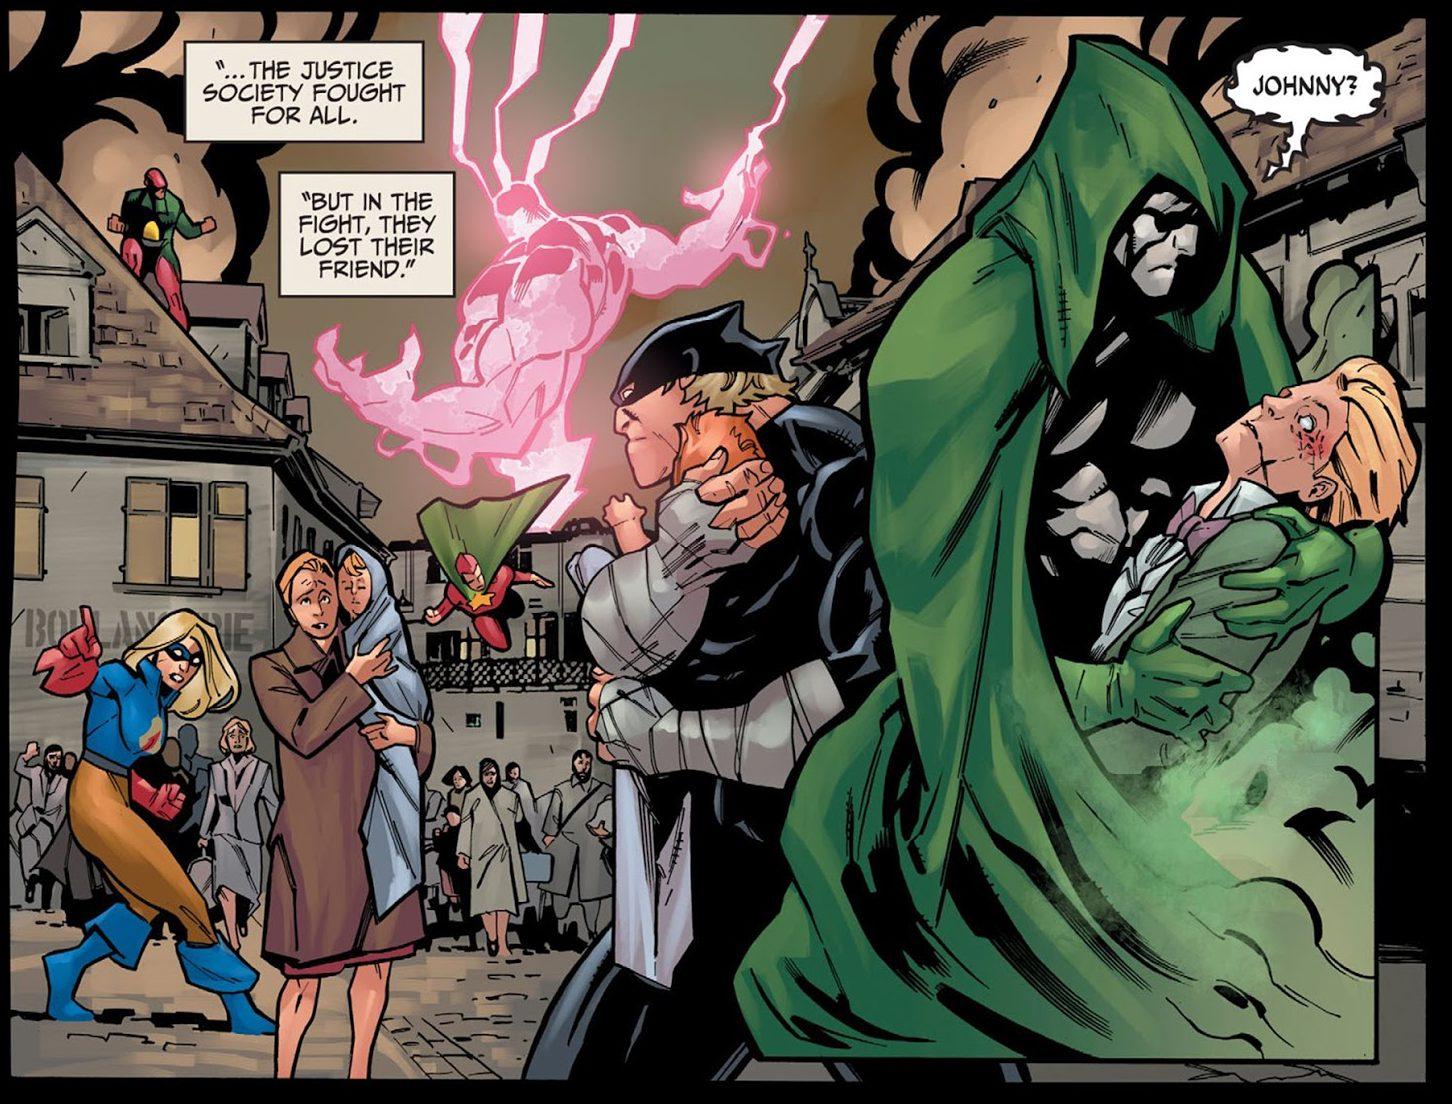 Justice Society Of America VS Yz (Injustice)